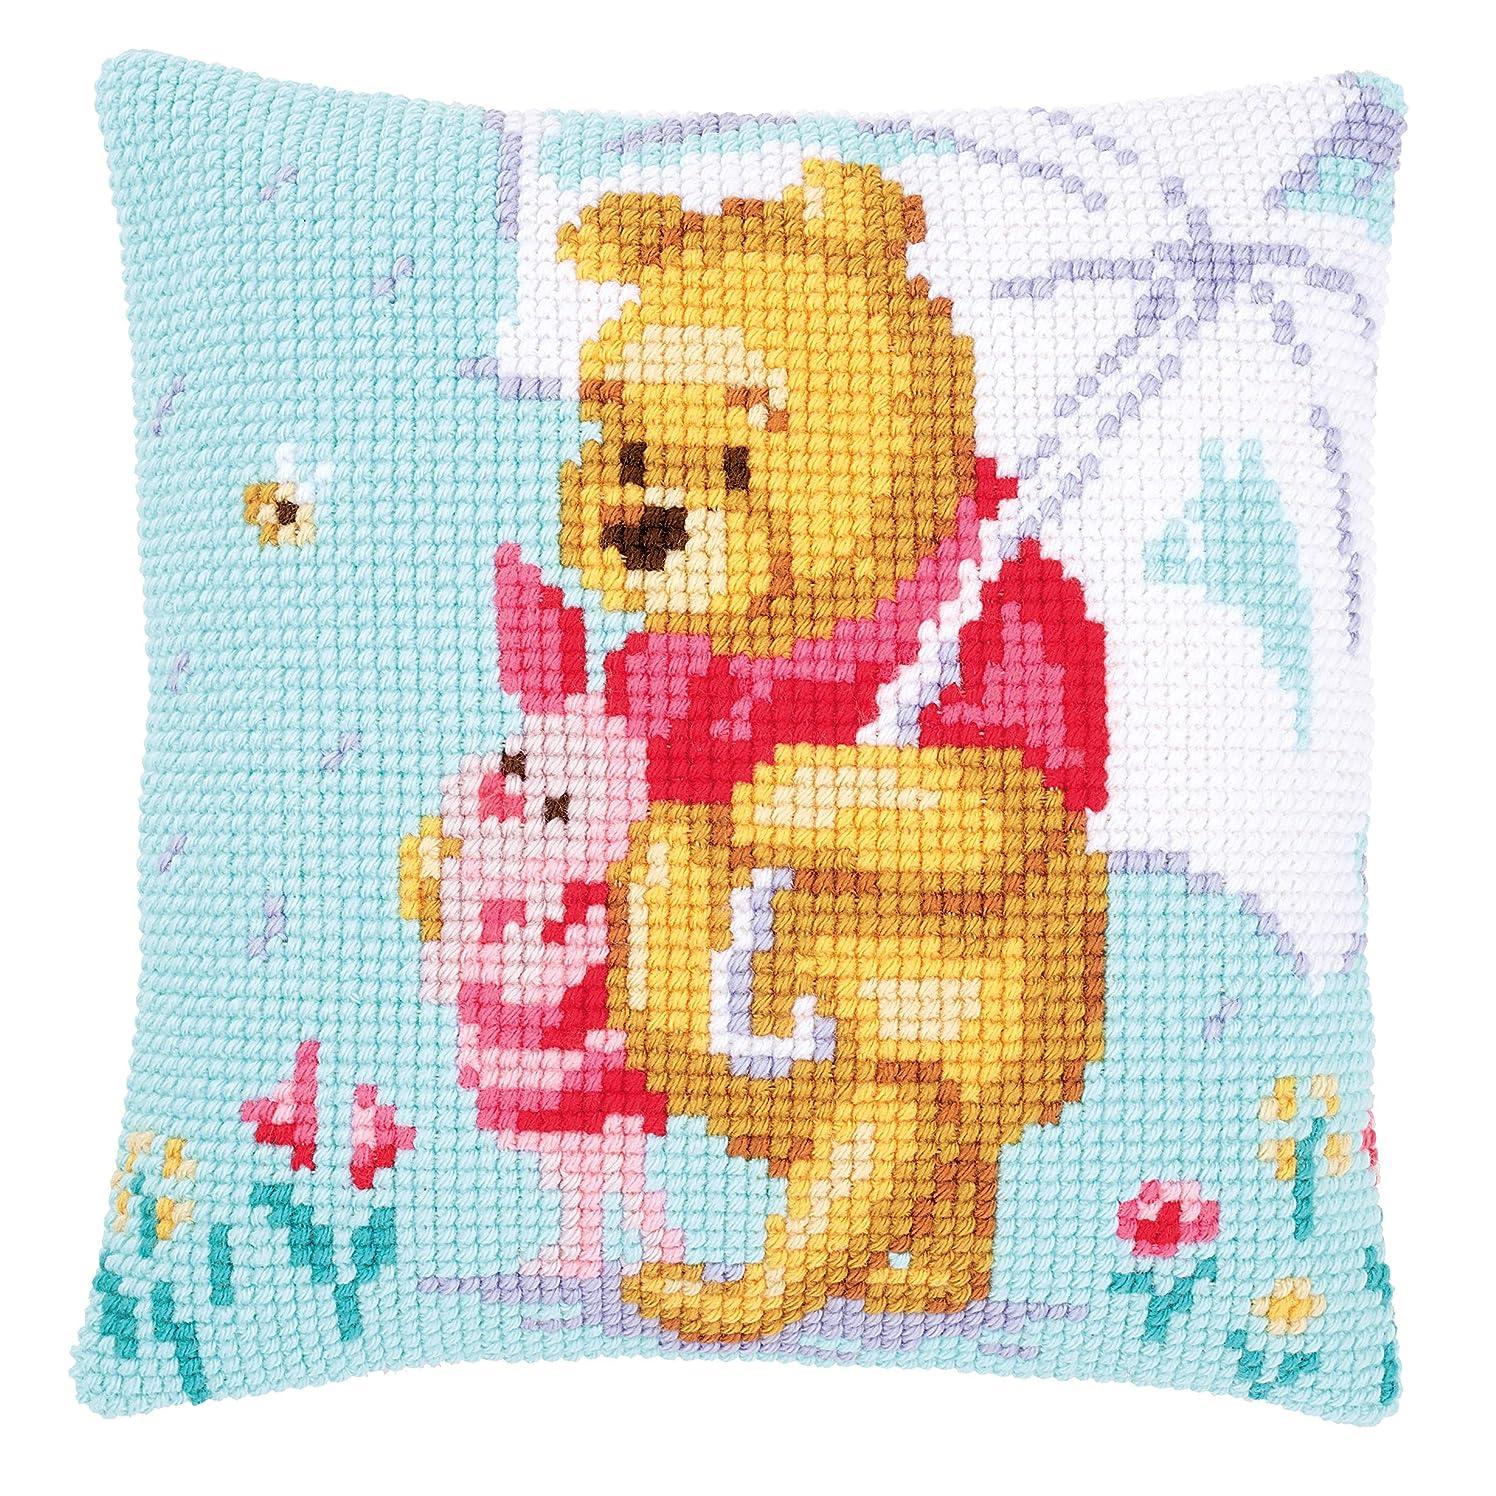 Disney Winnie The Pooh 'Winnie in The Rain' Counted Cross Stitch Kit